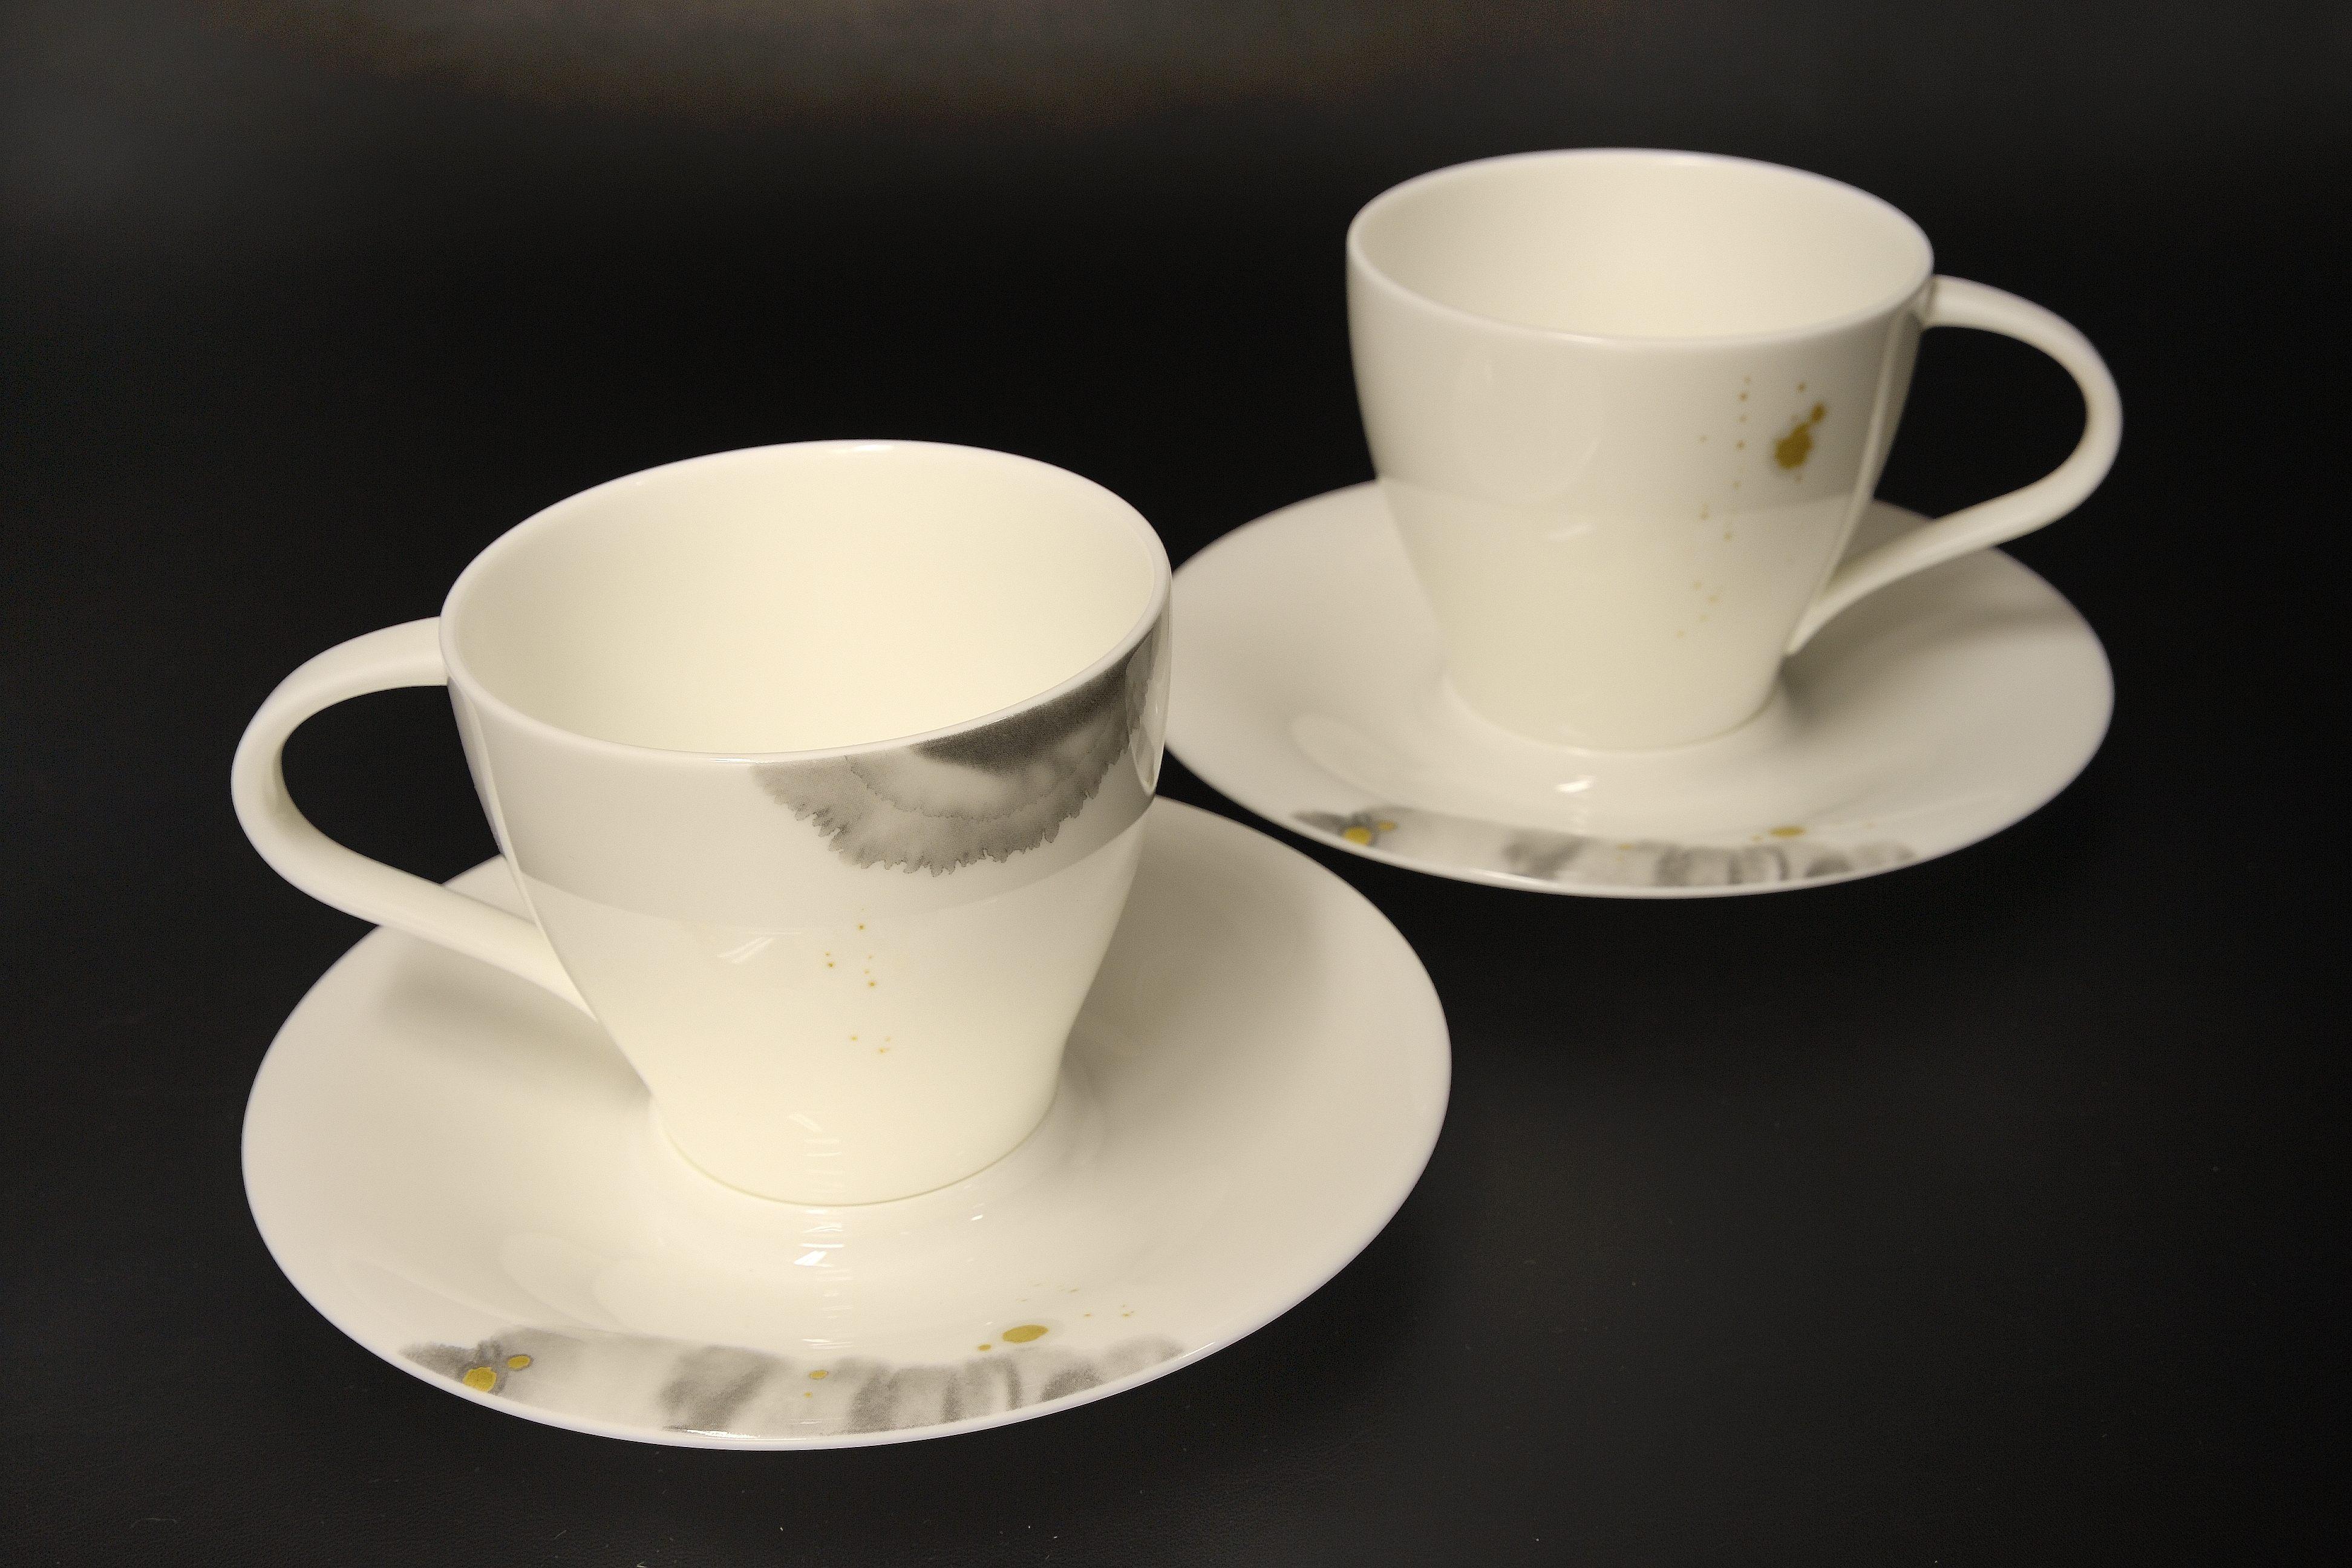 11115-CC00ボーンチャイナ コシノヒロコ ペアカップ&ソーサーセット【1753-s0776】